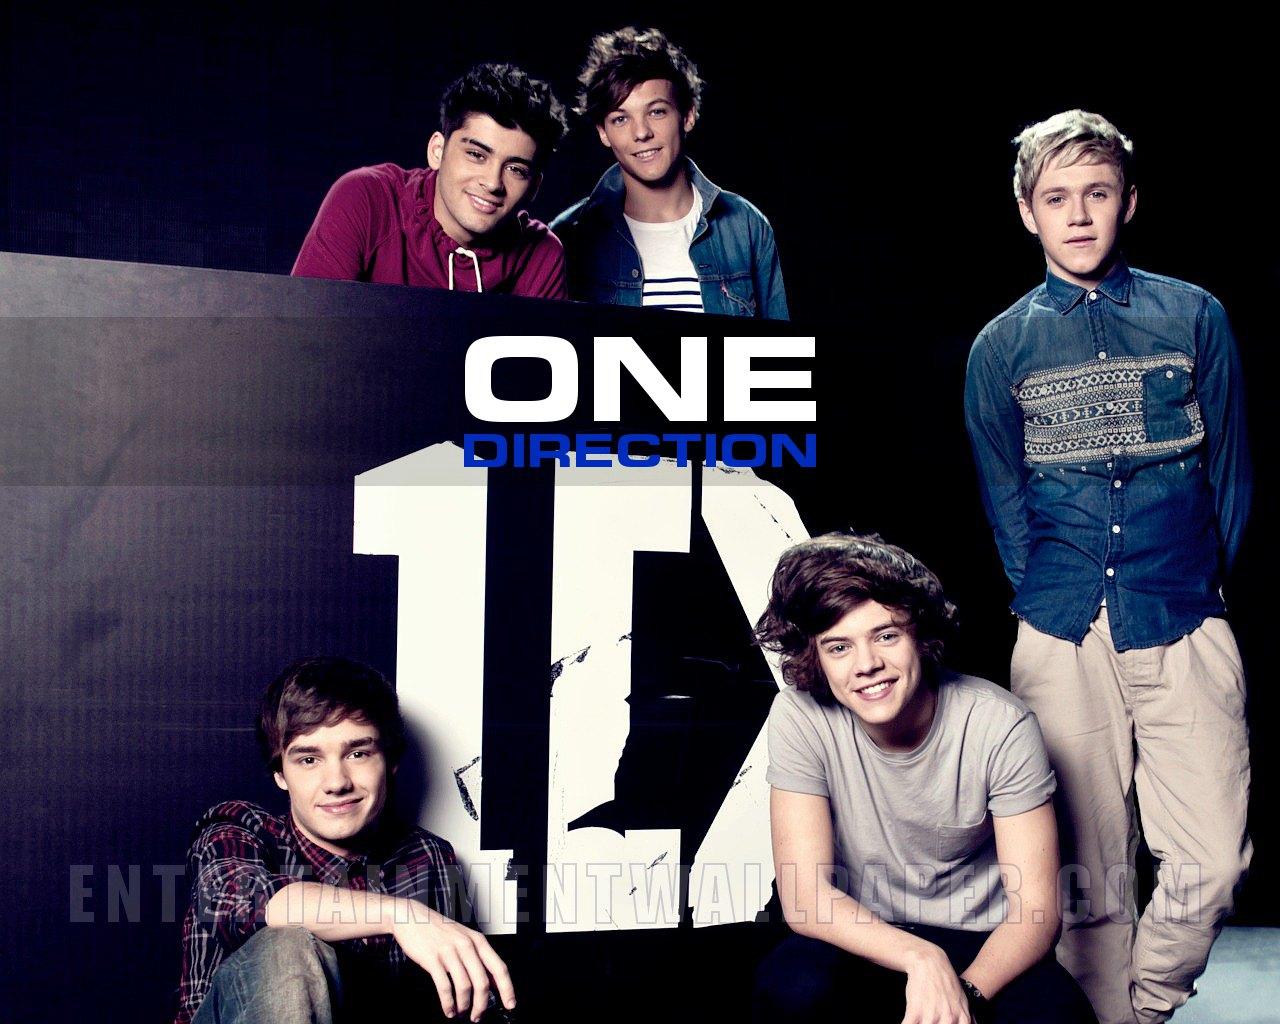 One Direction Wallpaper ❤ - One Direction Wallpaper Hd - HD Wallpaper